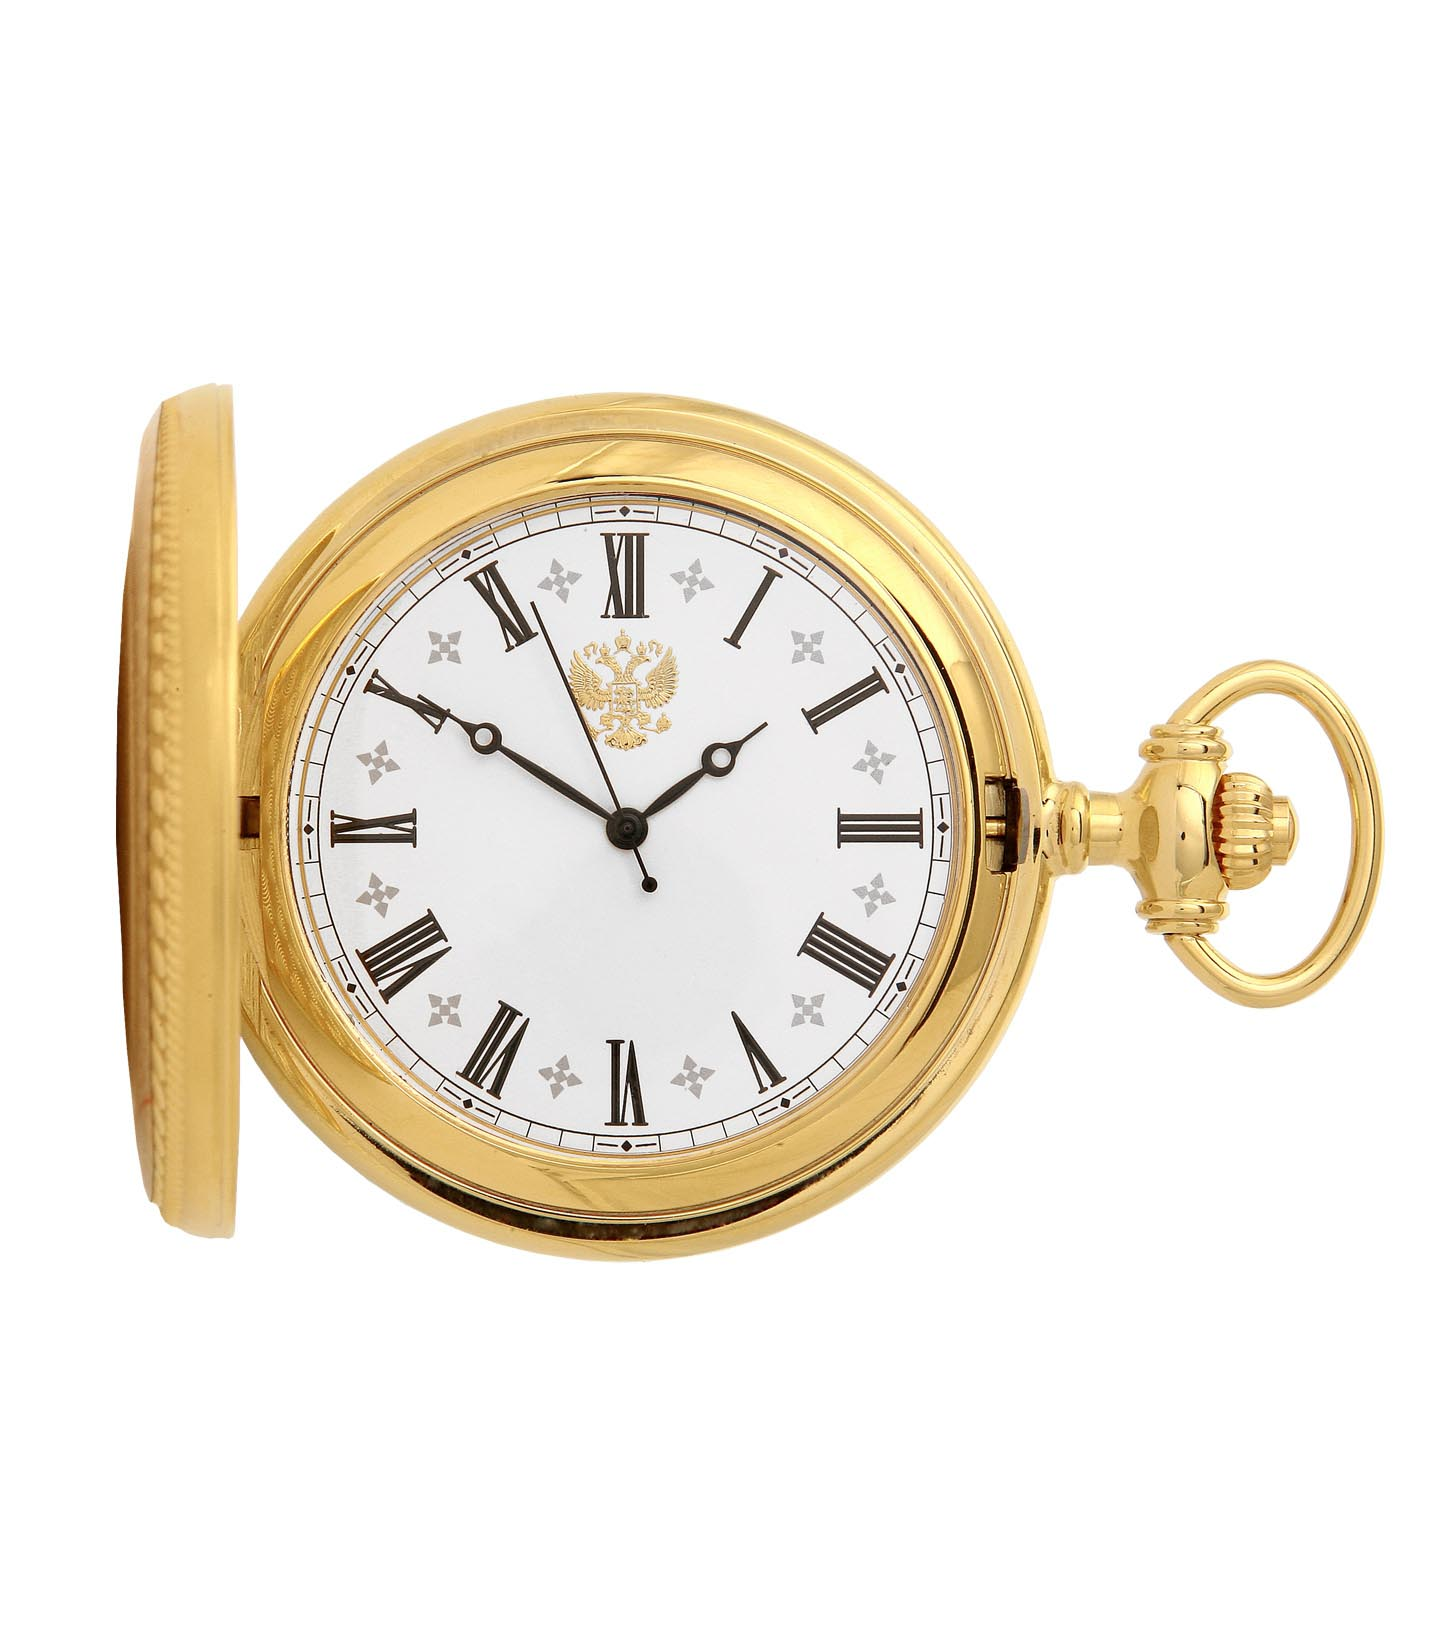 часы мужские карманные